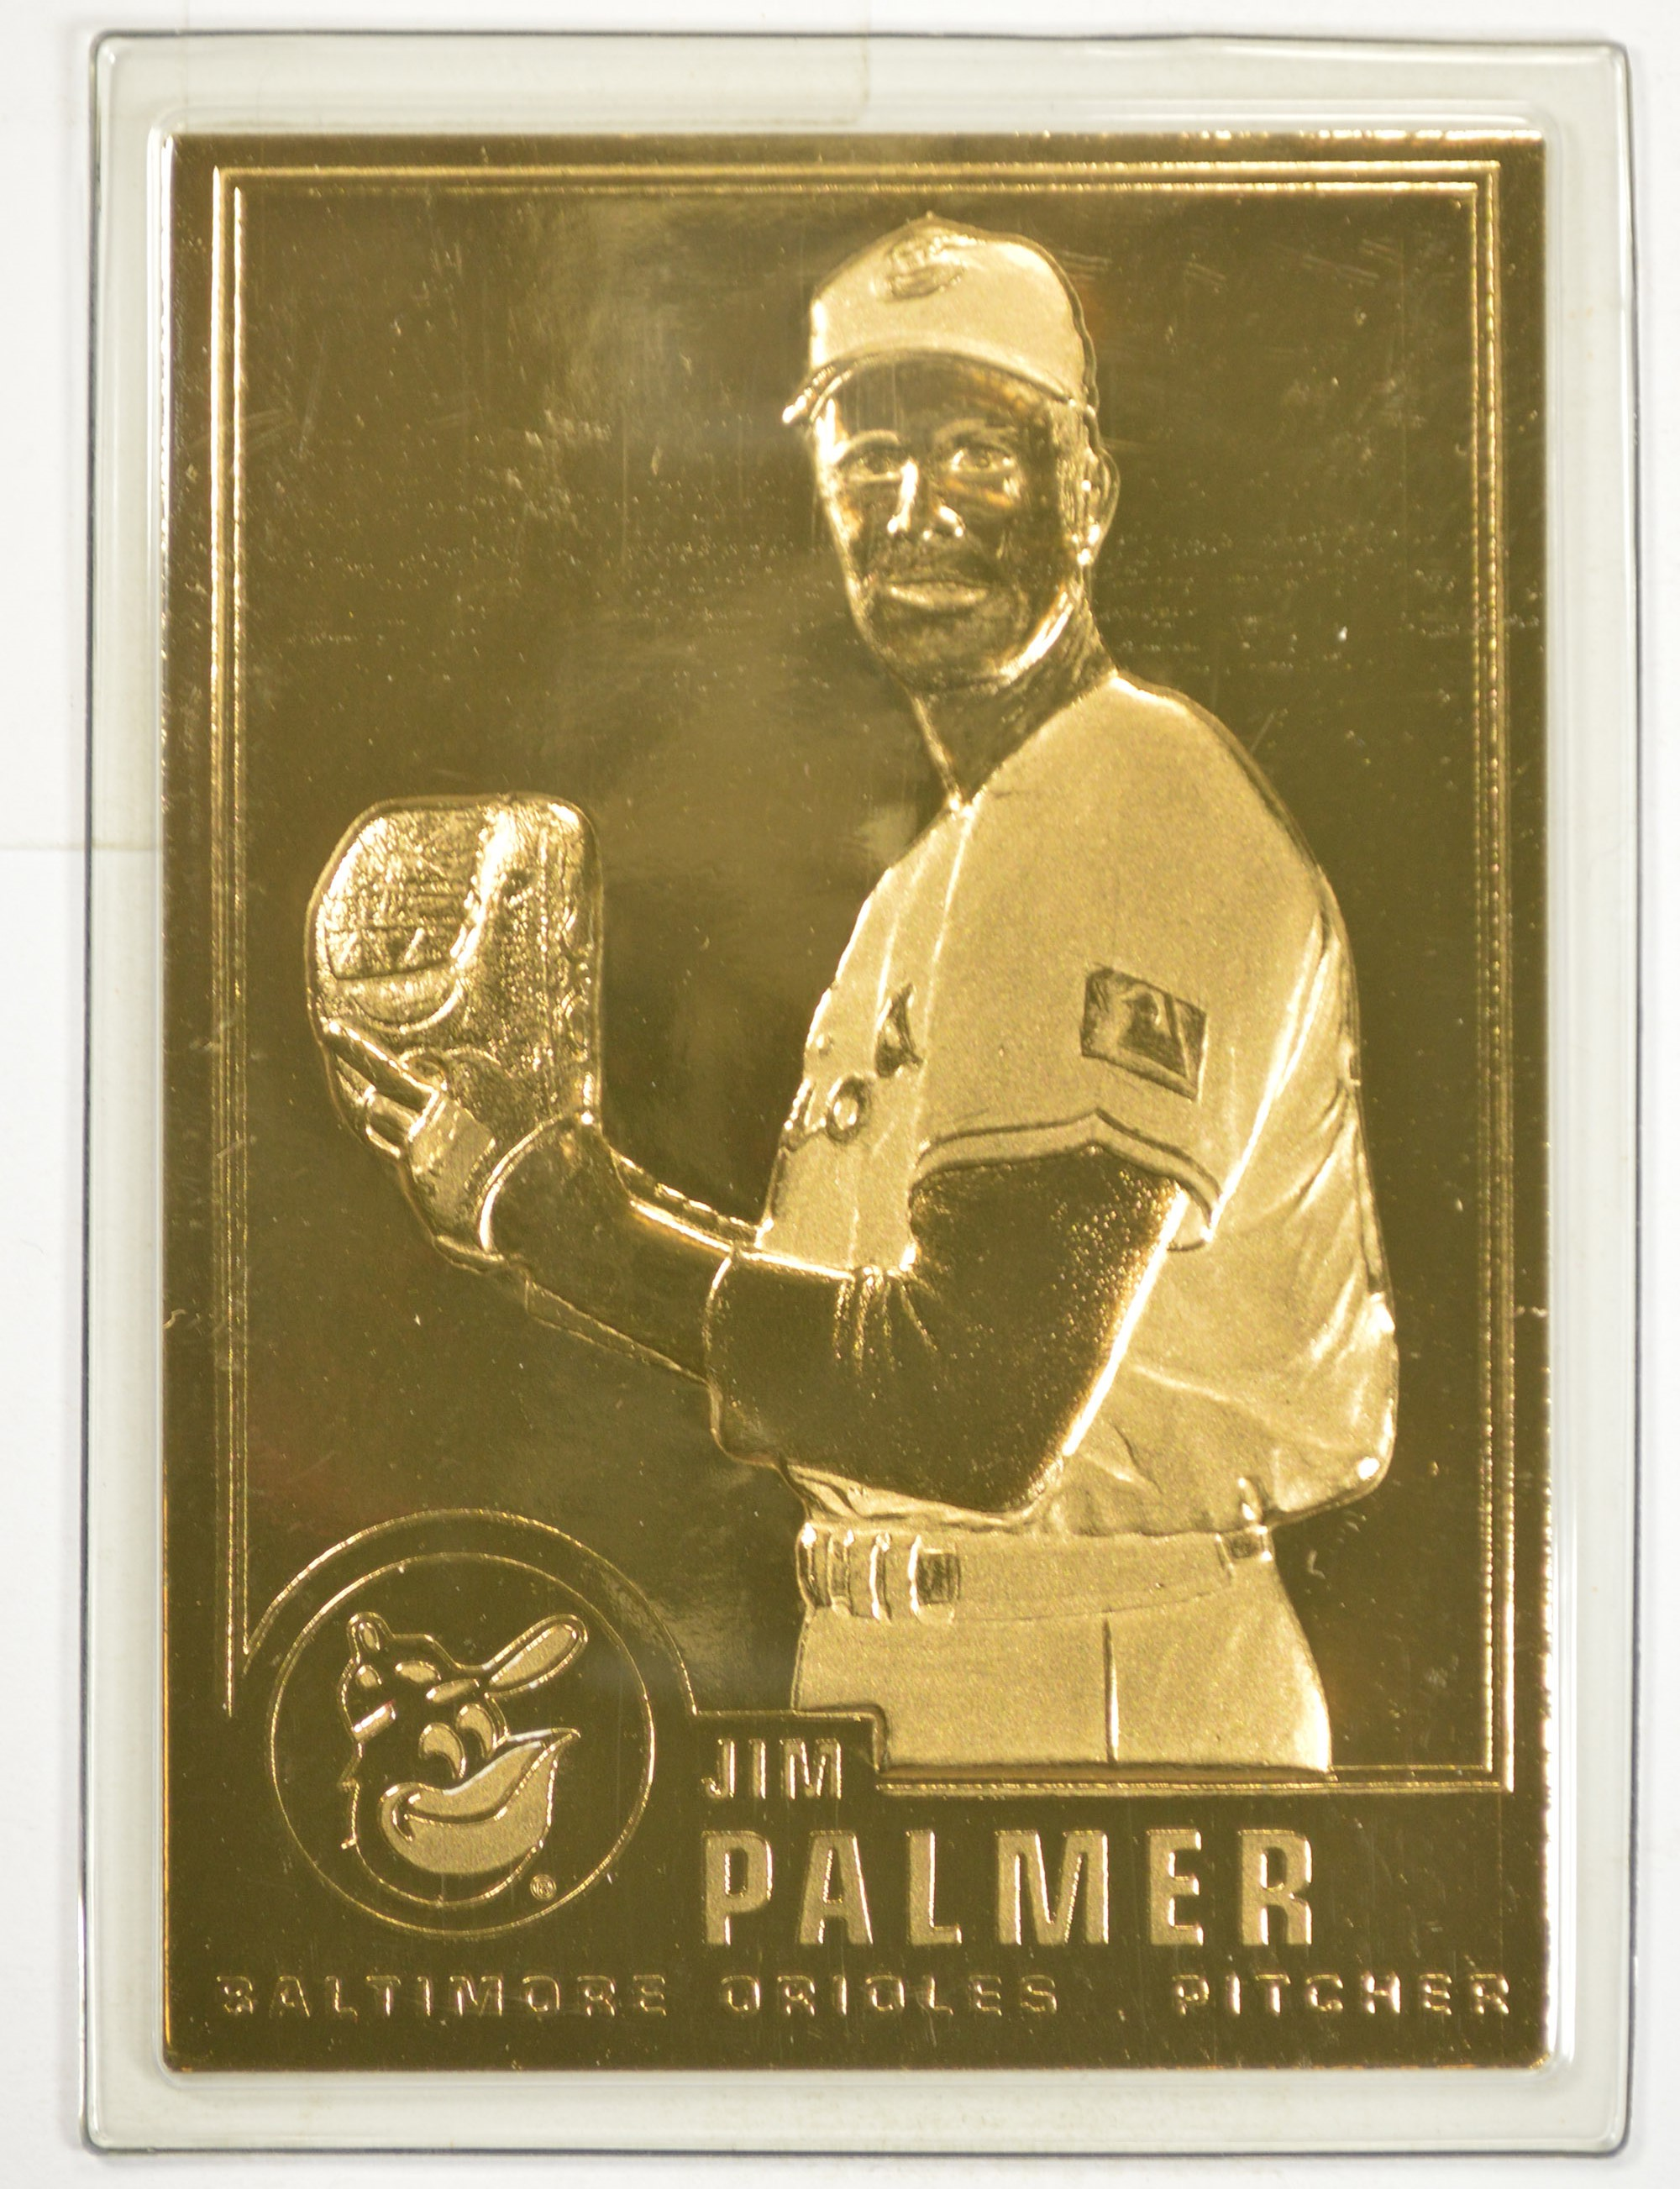 22k Gold Jim Palmer Limted Edition Danbury Mint Baseball